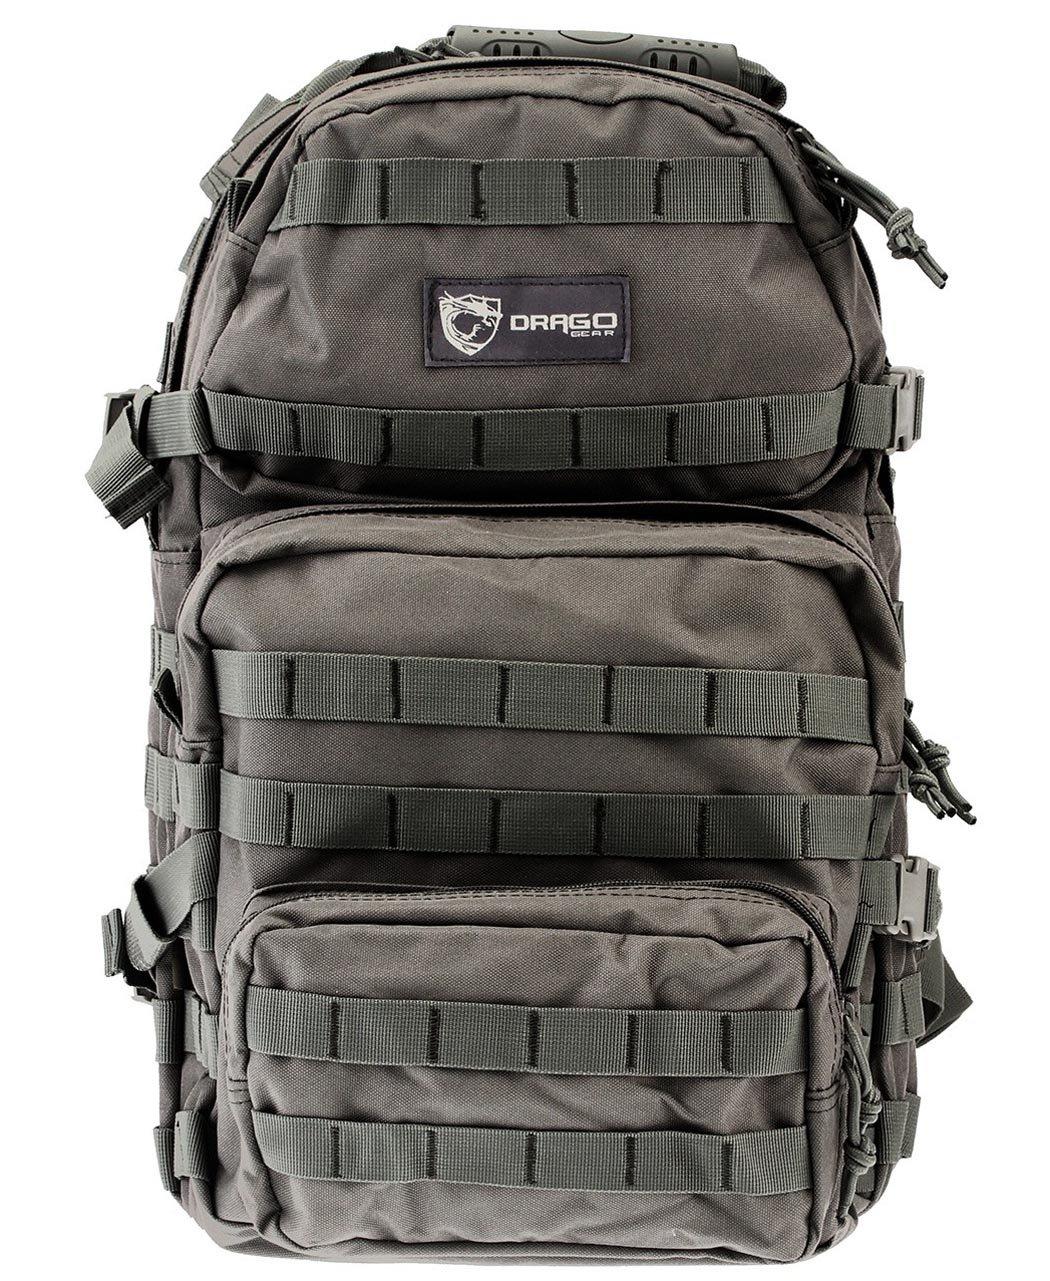 Drago Gear Assault Back Pack, Grey A.C. Kerman - LE DRG14-302GY